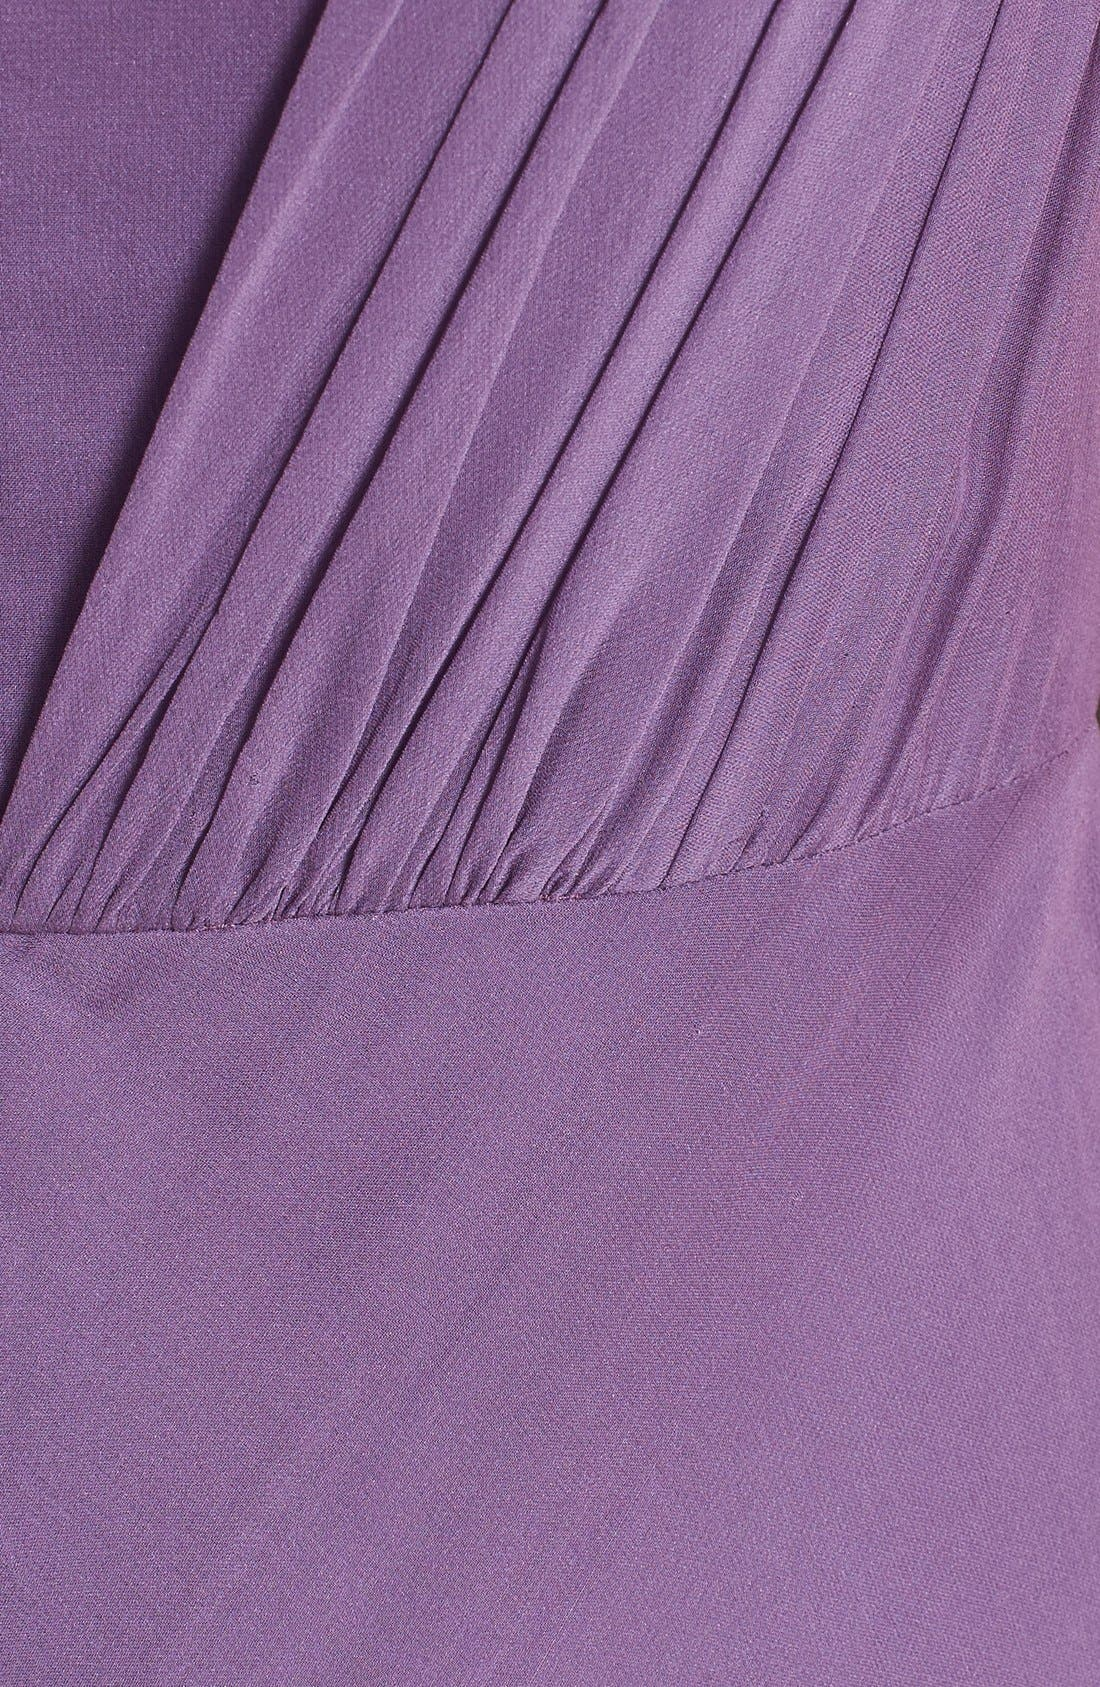 Alternate Image 3  - Vera Wang Shirred Chiffon Gown